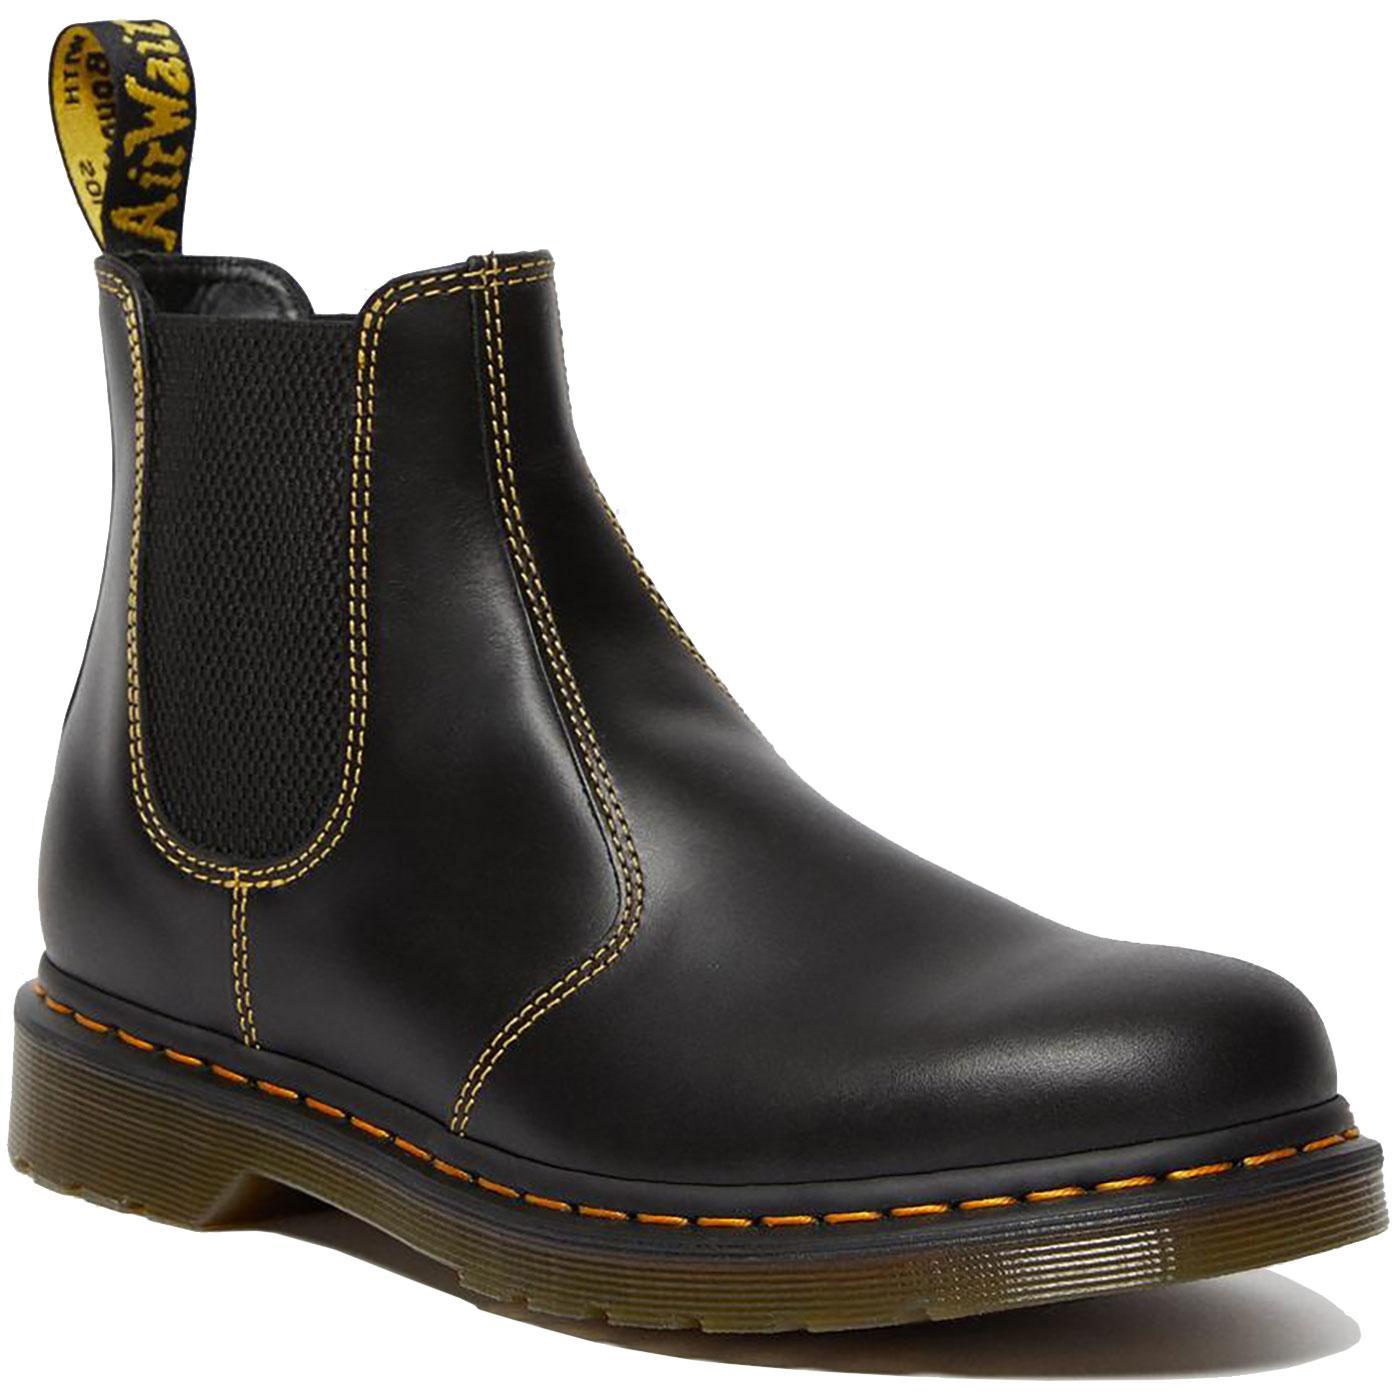 2976 DR MARTENS Mens Atlas Leather Chelsea Boots G